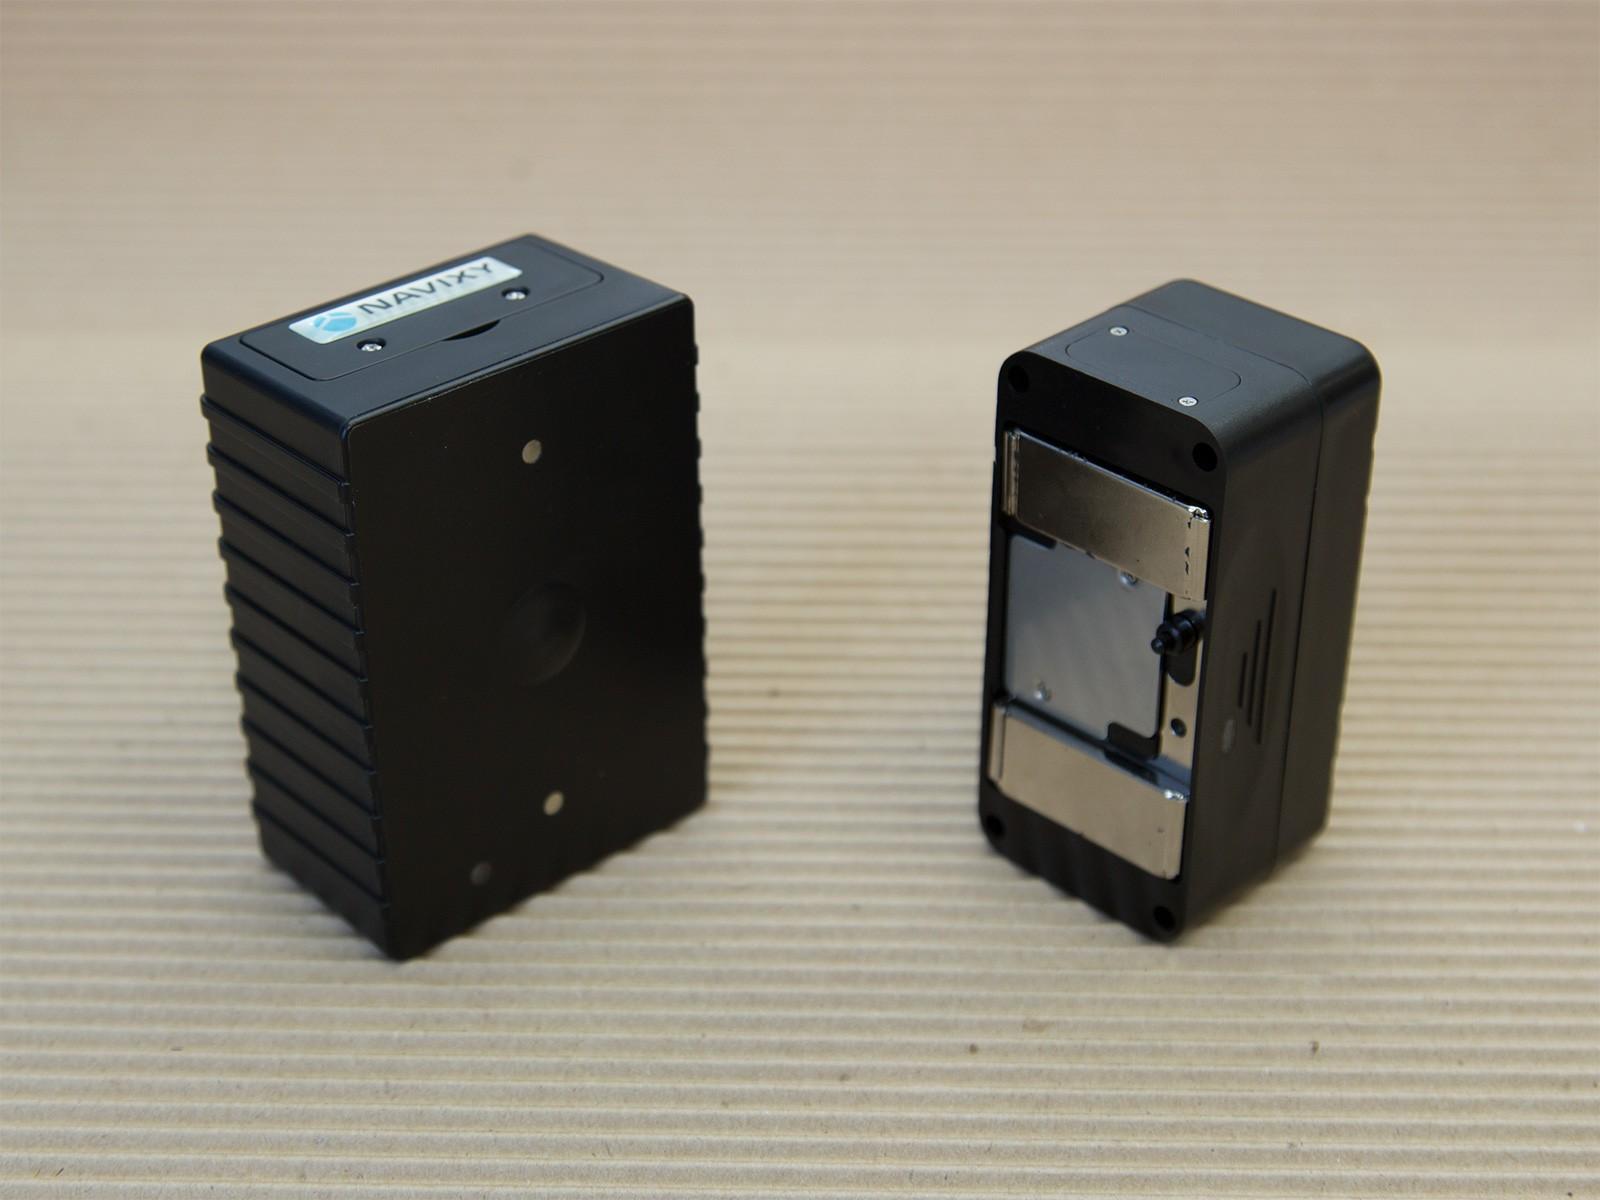 GPS-трекер сравнение ГдеМои M7 и ГдеМои M6